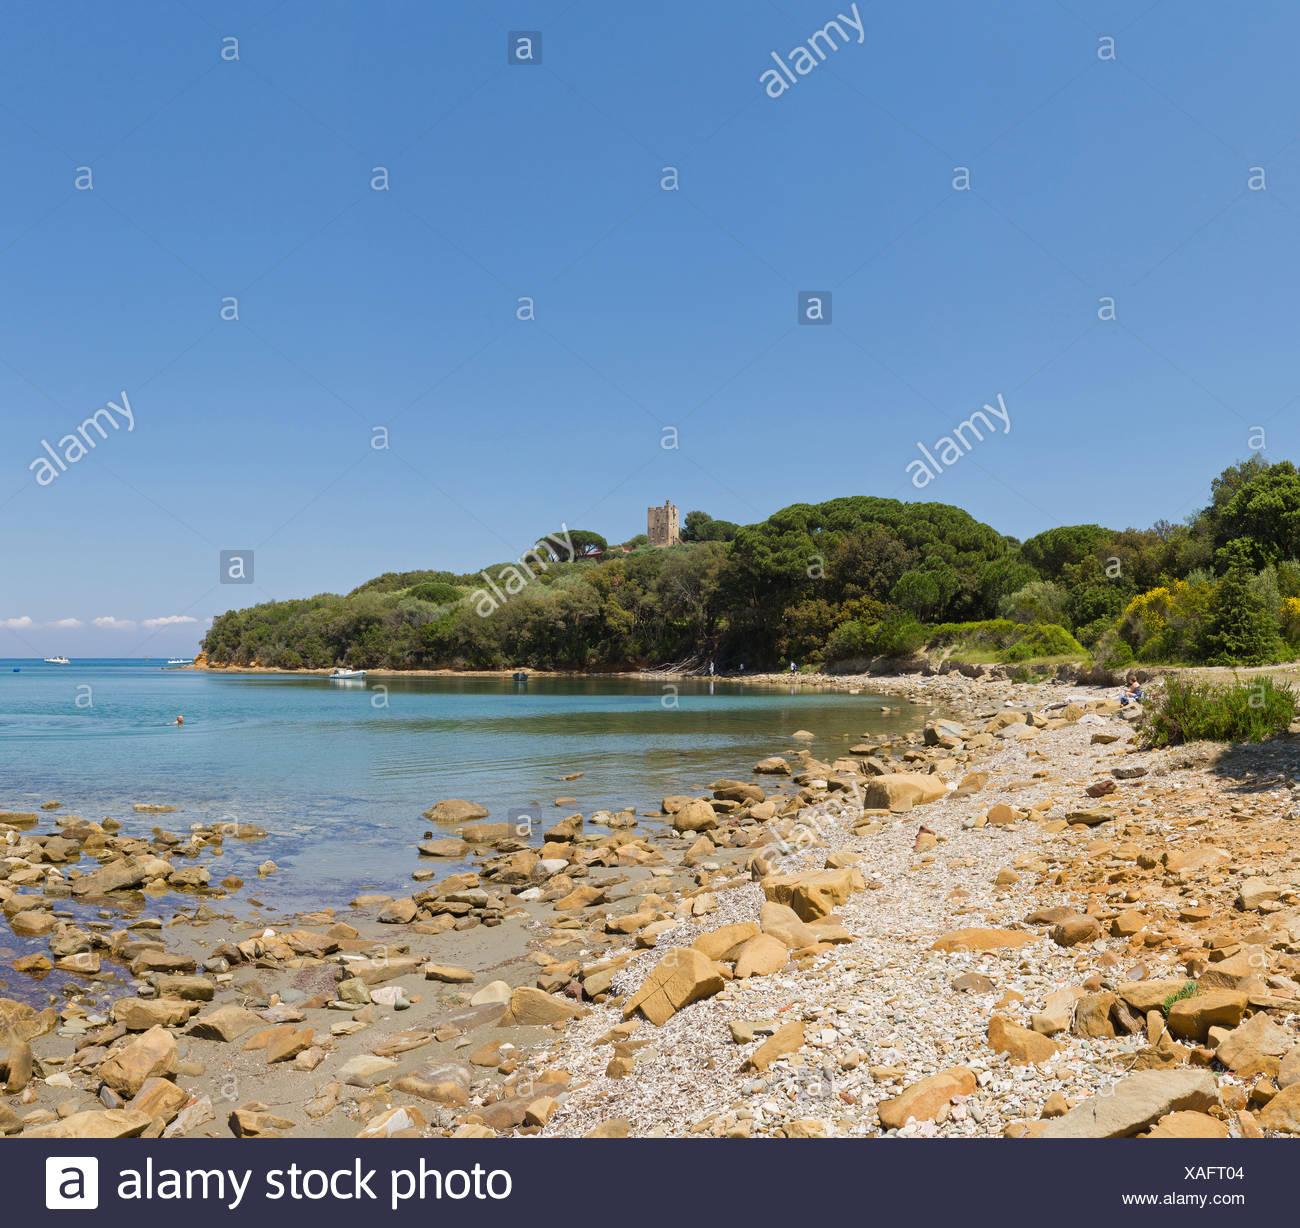 Punta Ala, Italia, Europa, Toscana, Toscana, mare, shore, pietre Immagini Stock